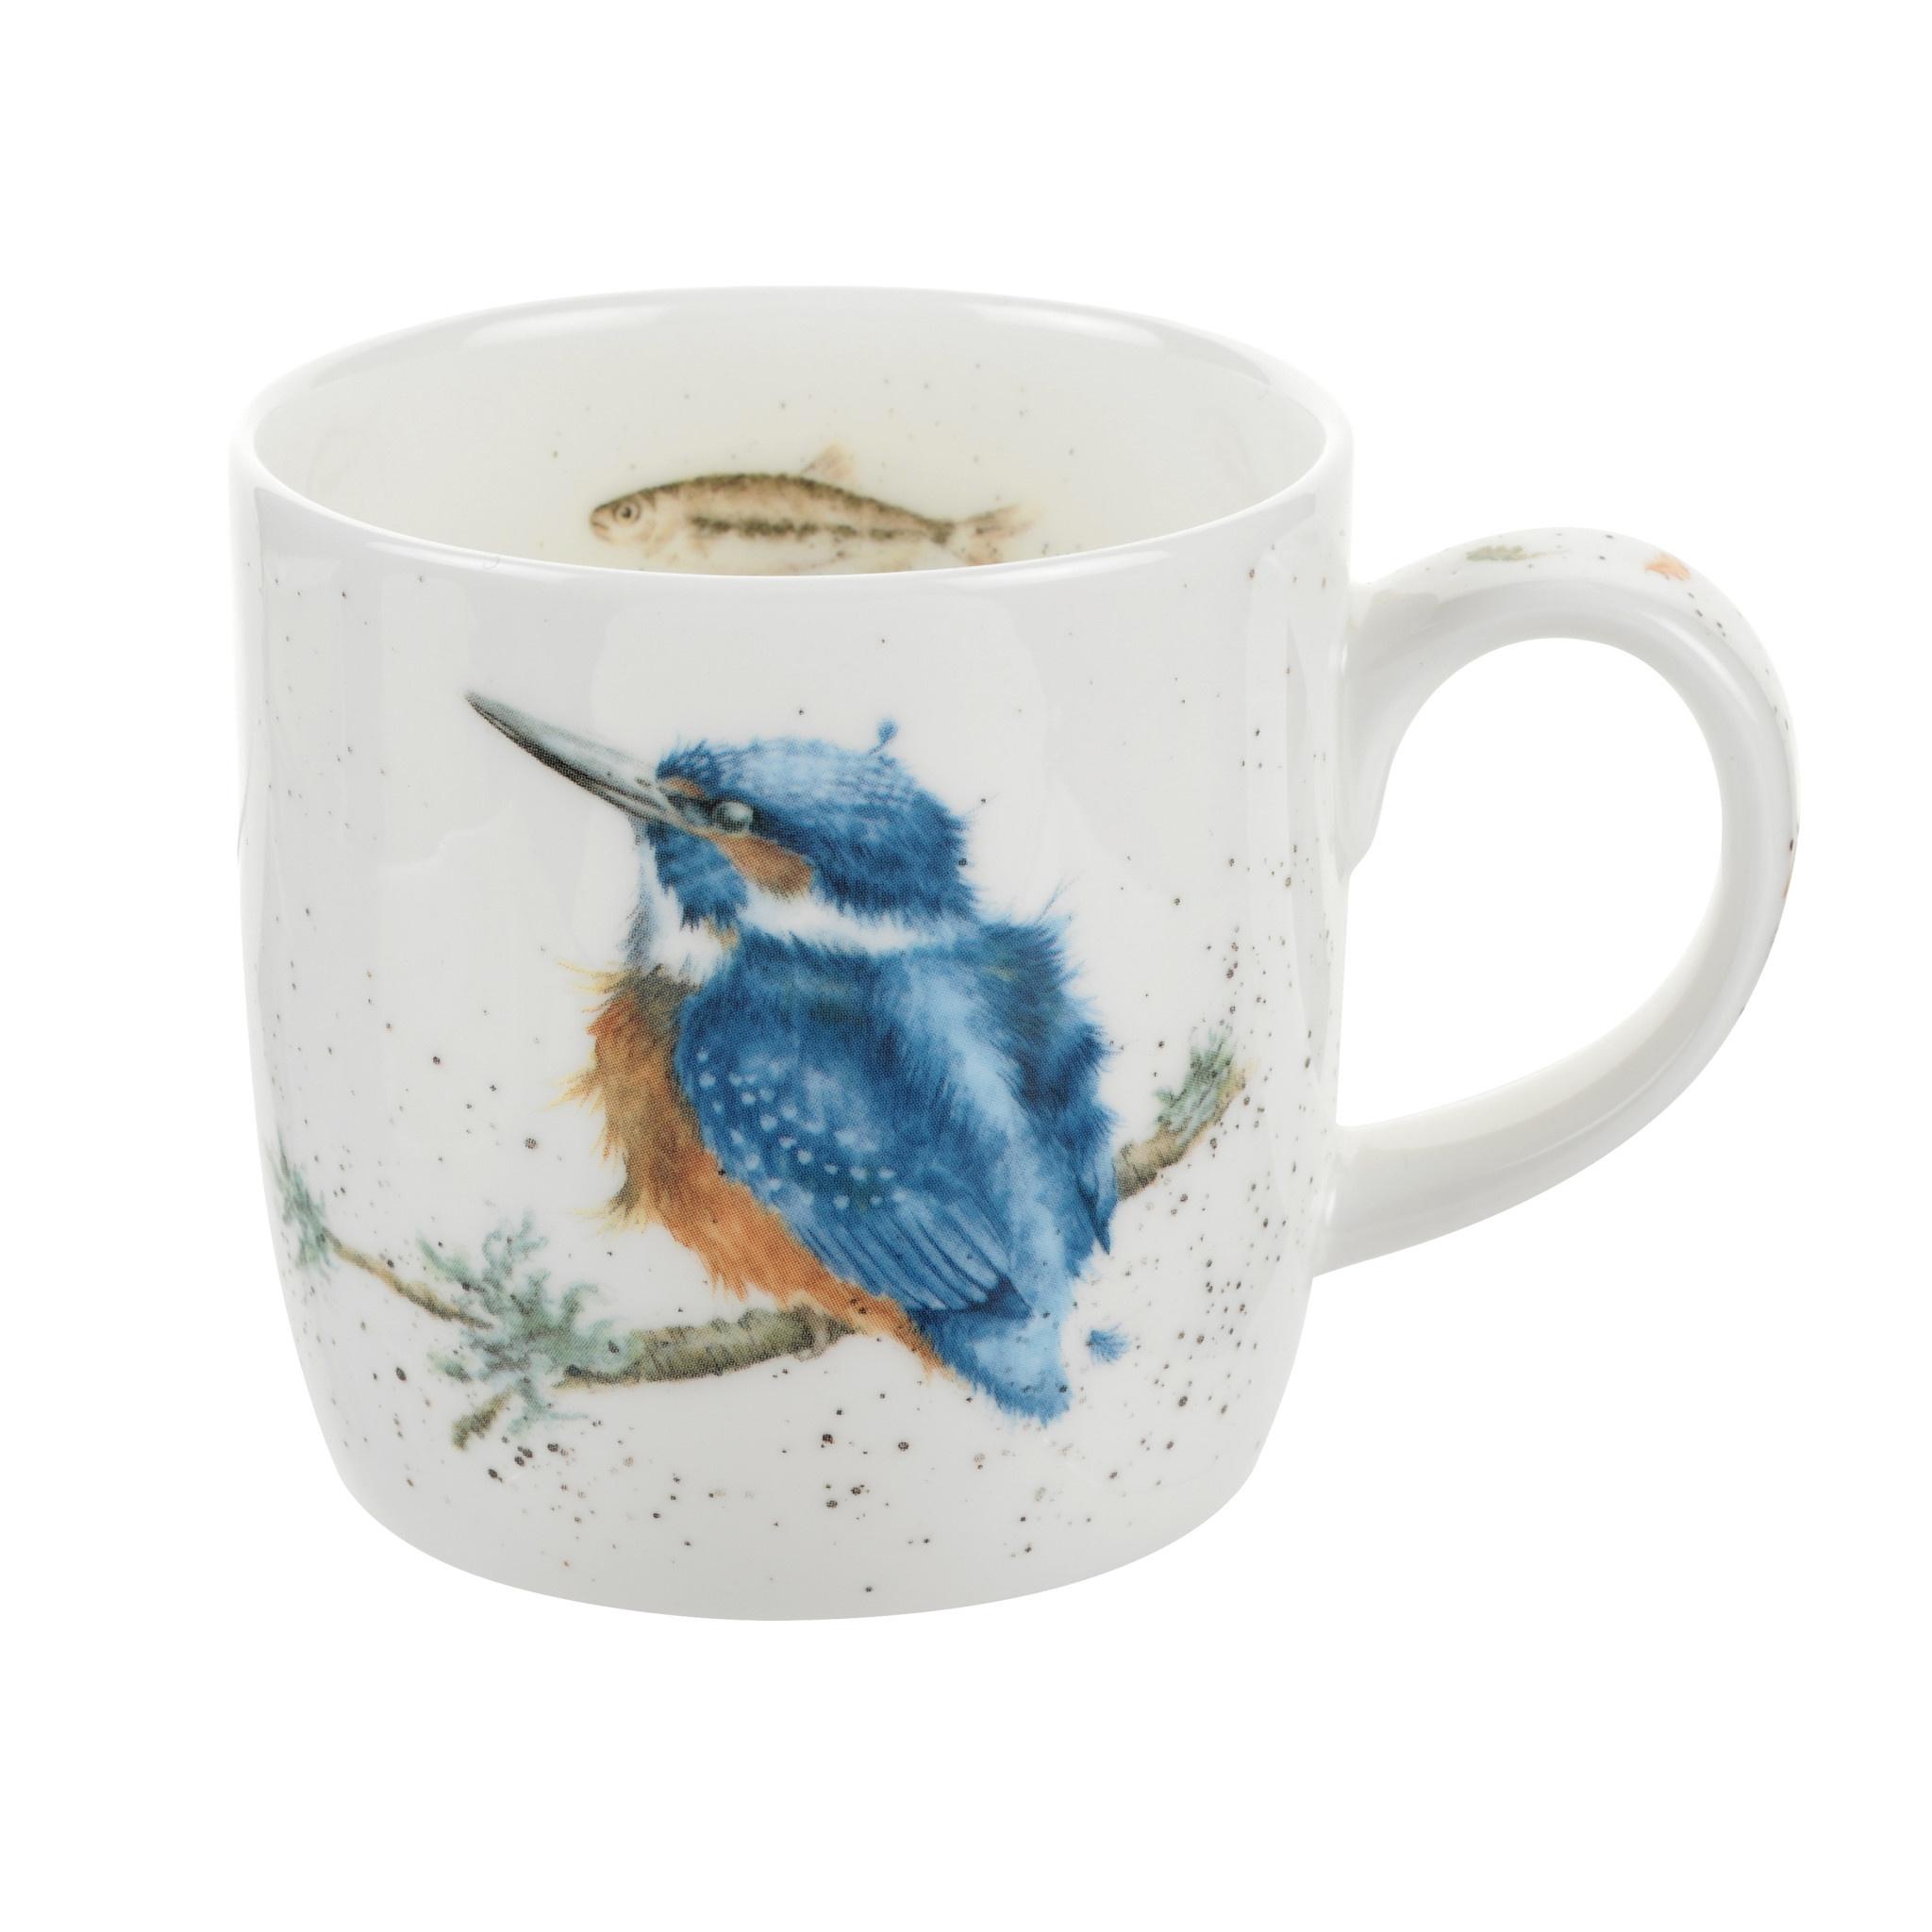 Wrendale Designs 'King of the River' Mug